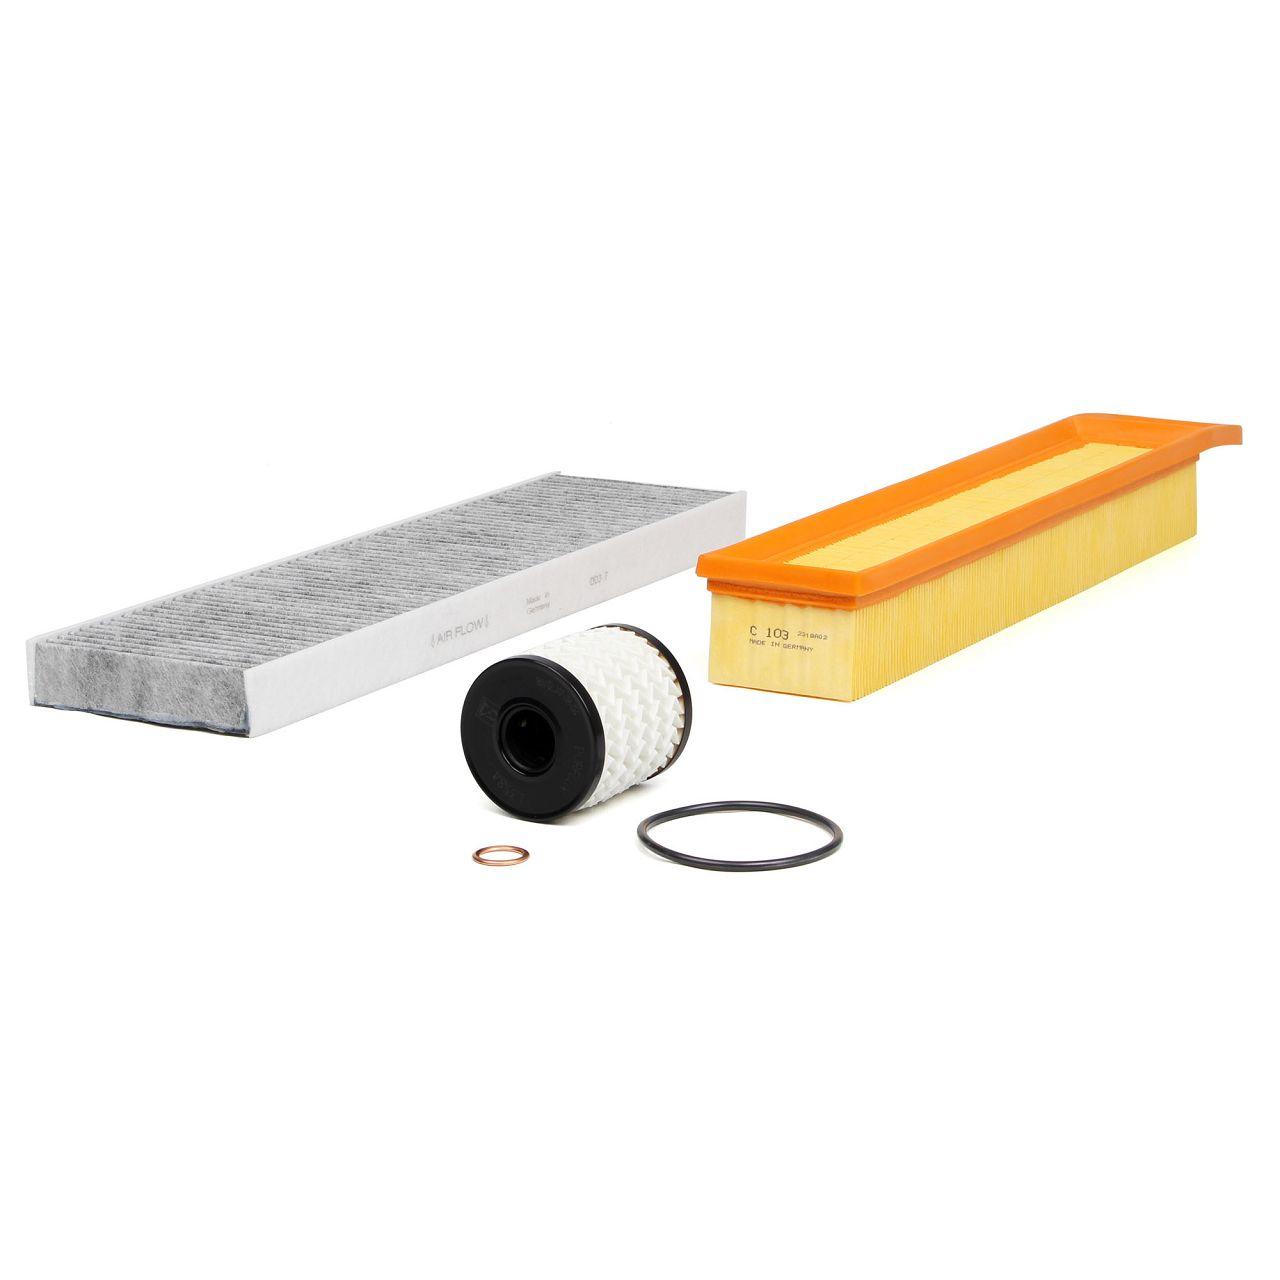 Inspektionskit für MINI R56 R57 R55 R60 R58 R61 R59 ONE / COOPER 75-122 PS